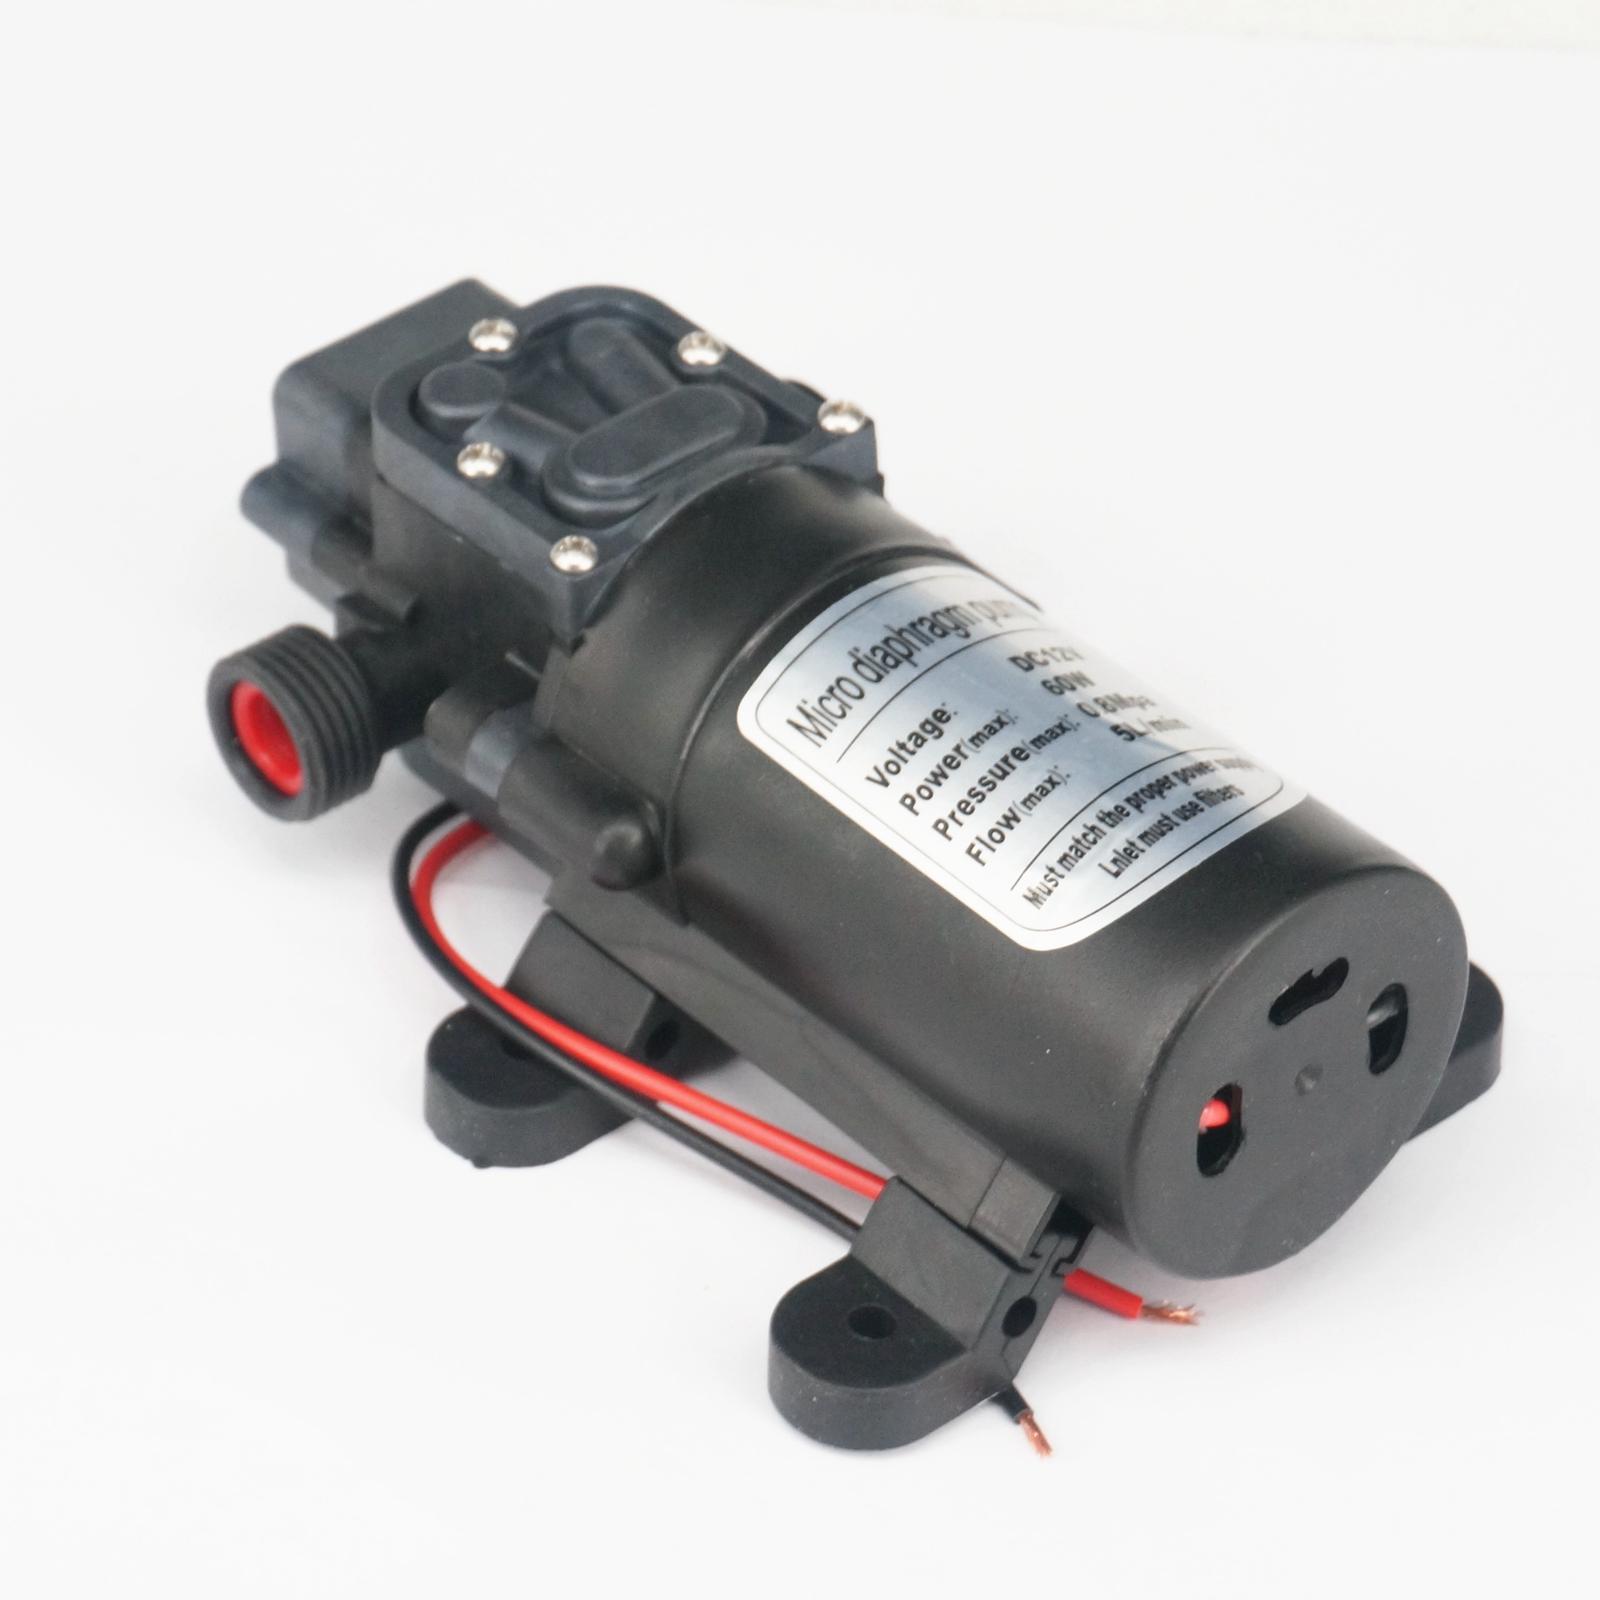 "1/2"" BSP Male DC 12V/24V 60W Electric Diaphragm Pump Self-priming Booster Backflow Control For  Car Washer 300L/H 0-60 Degree C"